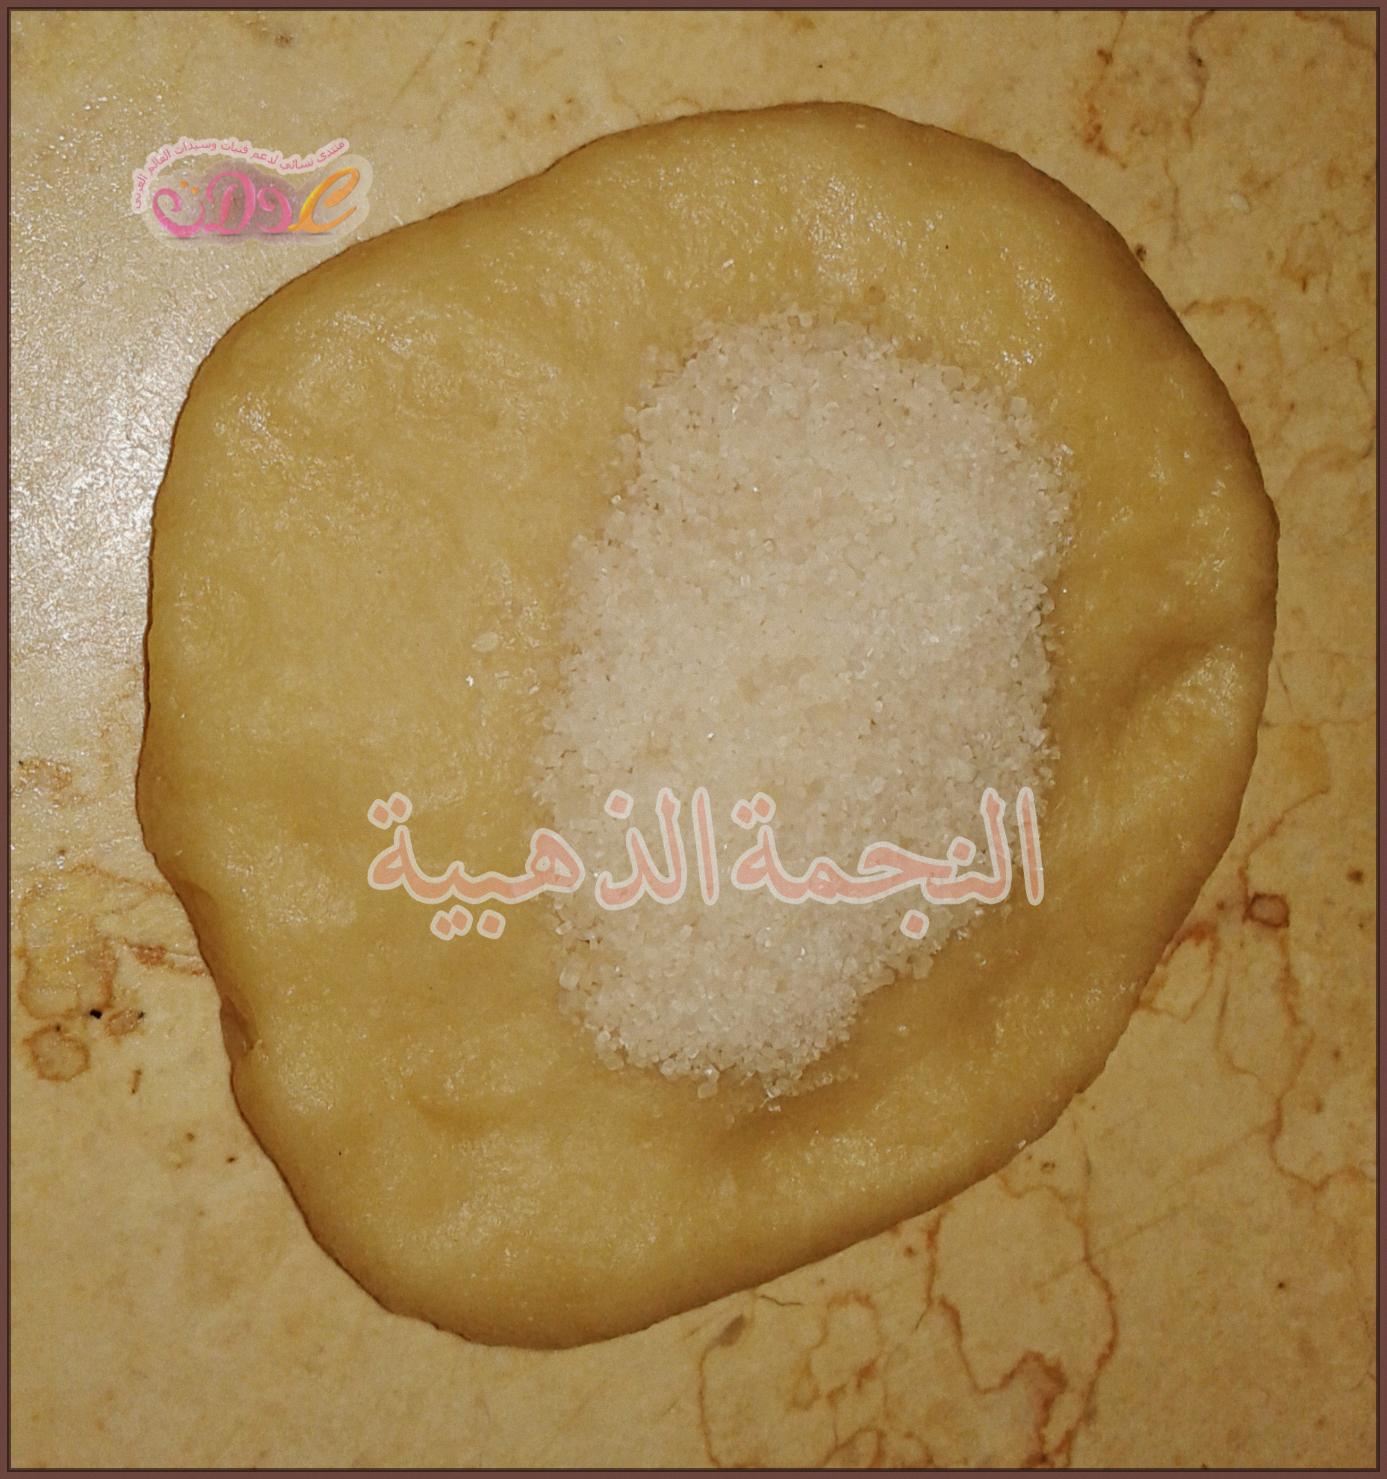 مطبخي] محشوه بالسكر .قرص بالسمسم لذيذه 3dlat.com_07_18_8965